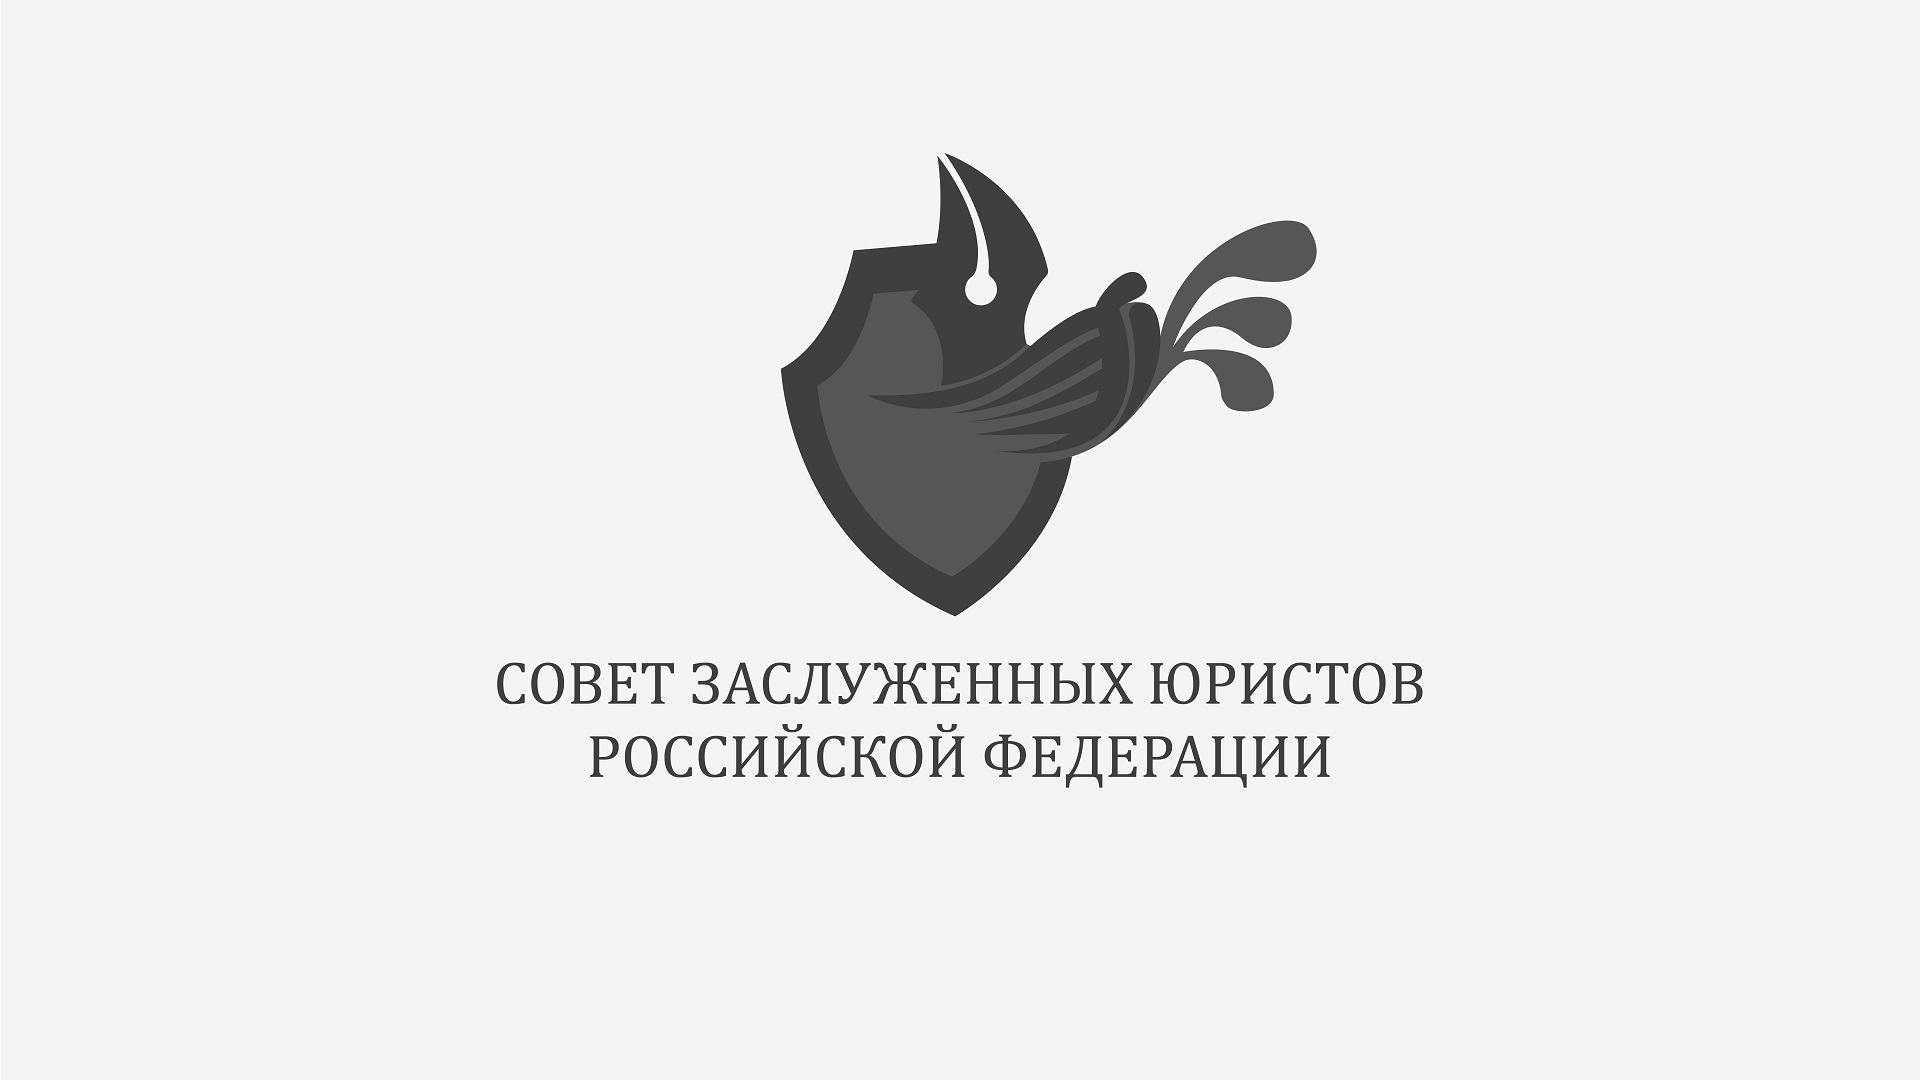 Разработка логотипа Совета (Клуба) заслуженных юристов Российской Федерации фото f_2575e3dab5ff3c3d.jpg